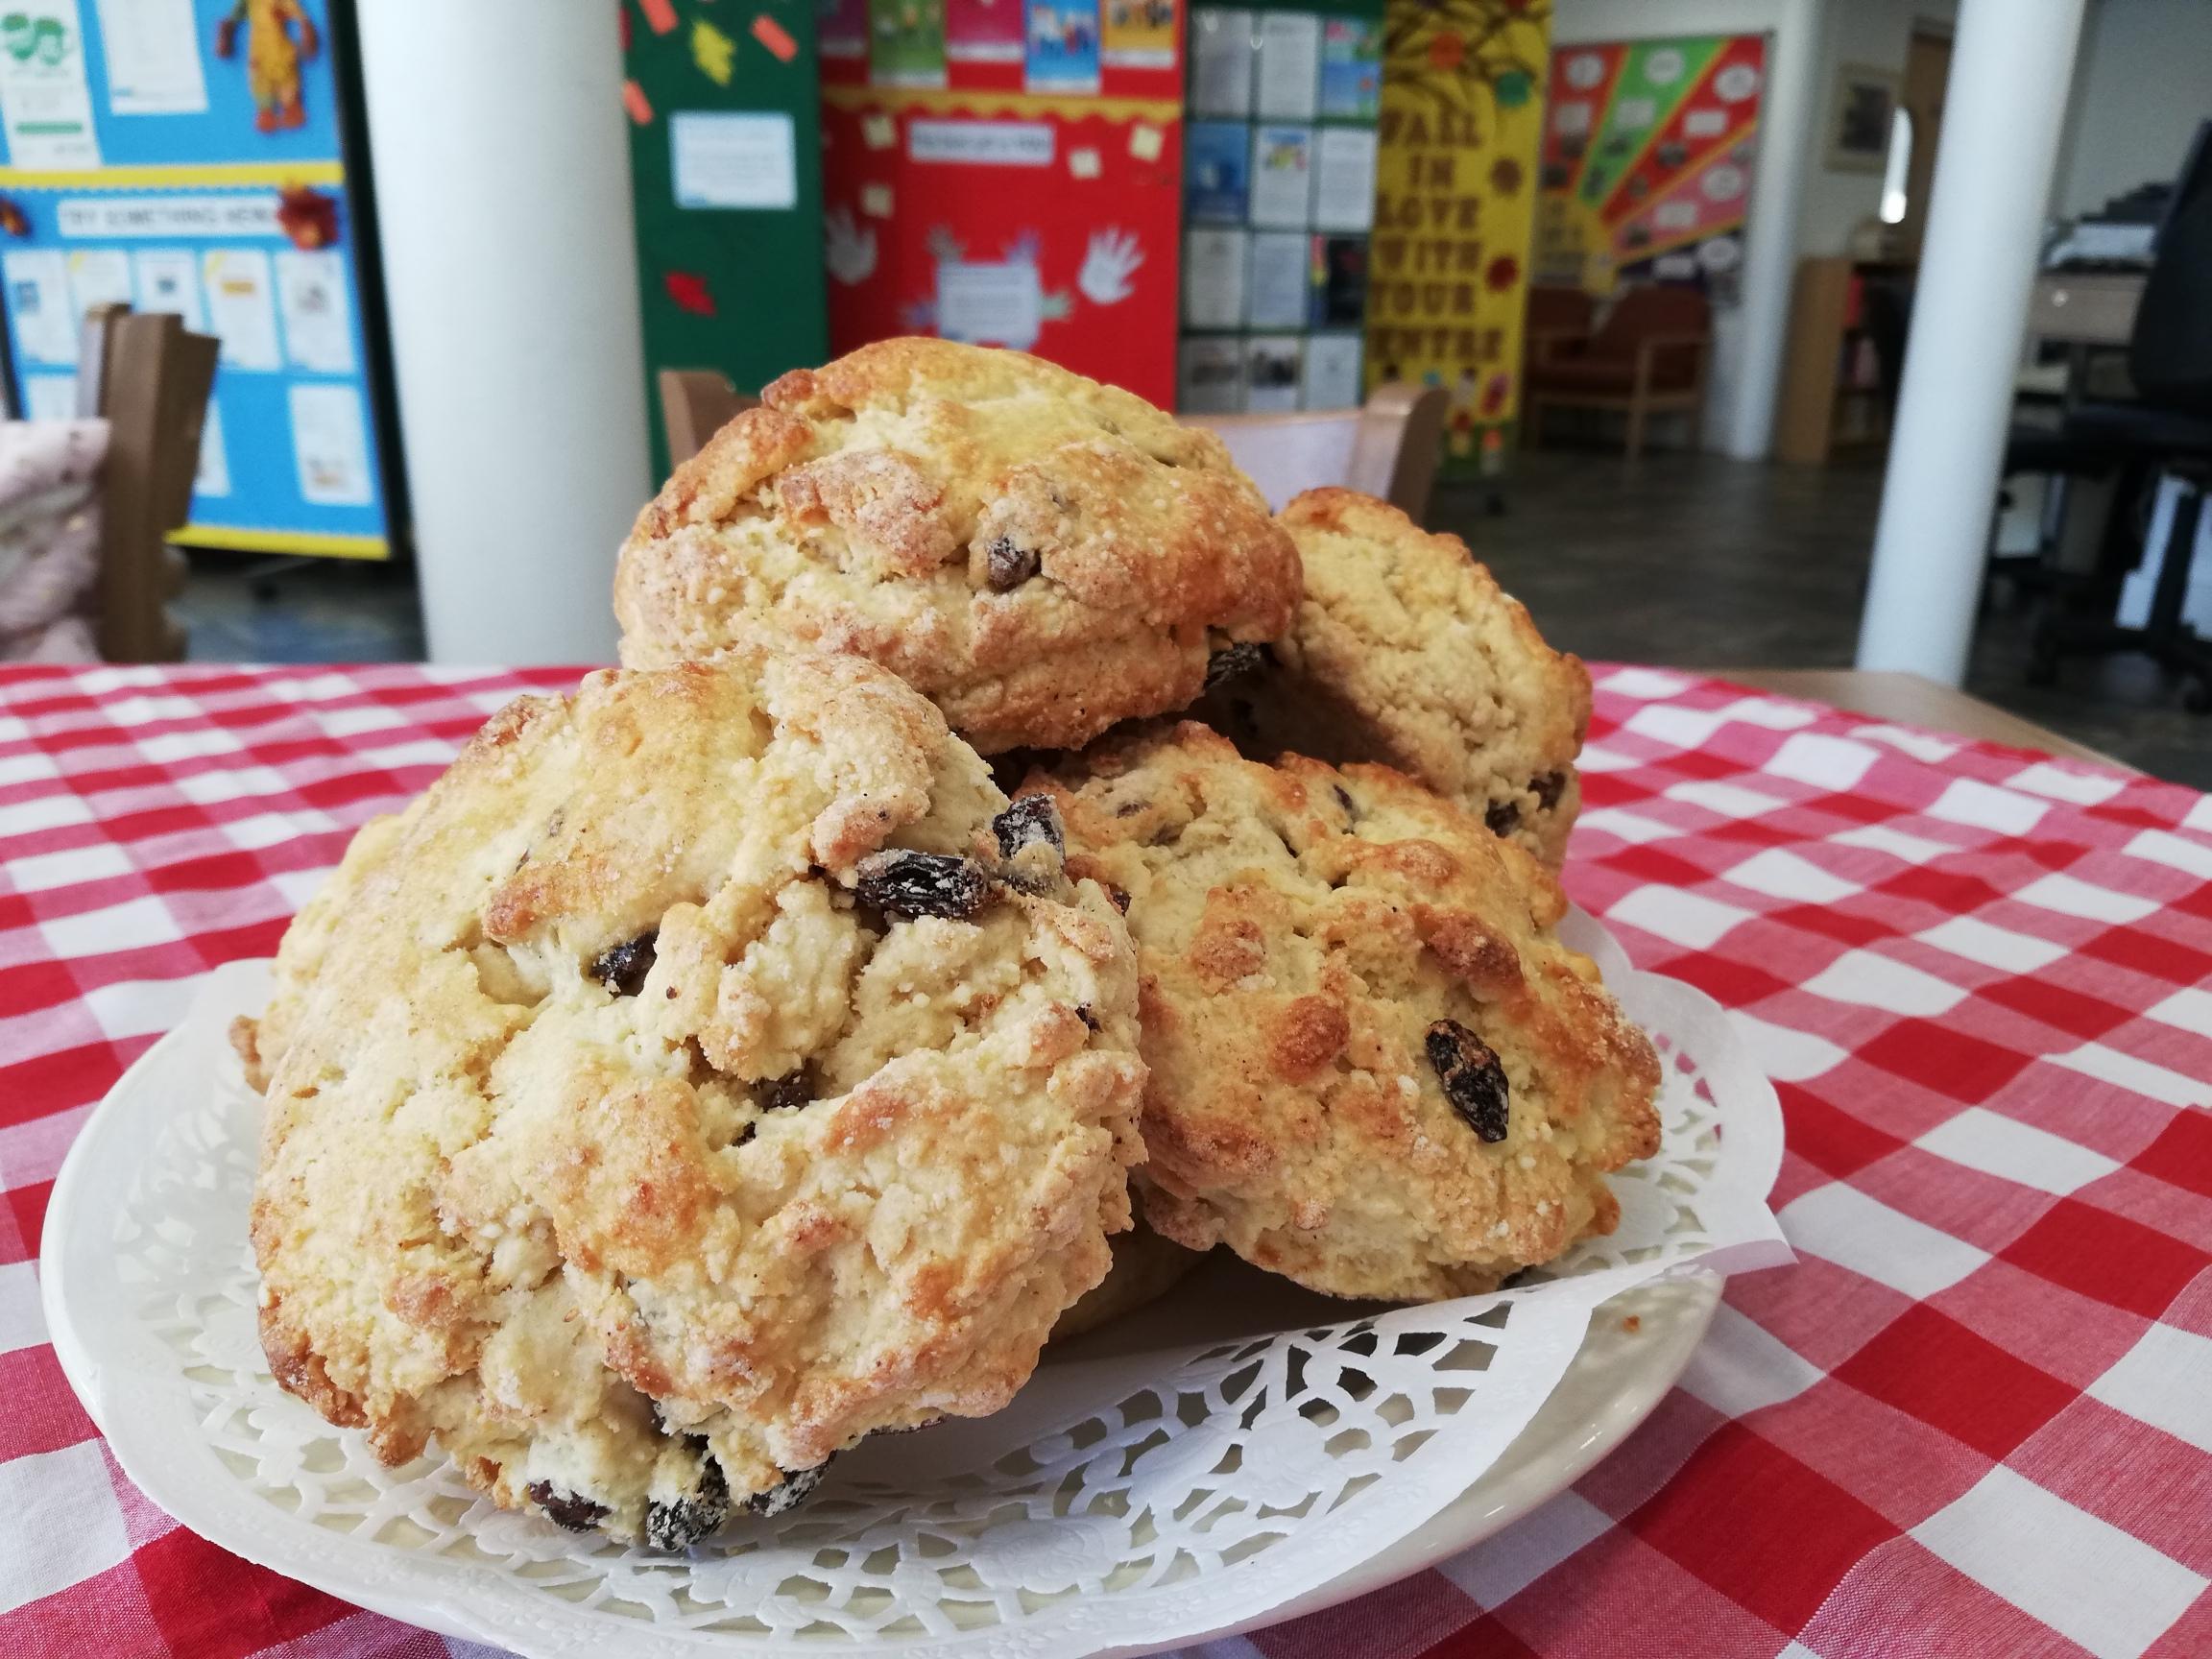 The best scones in Yorkshire